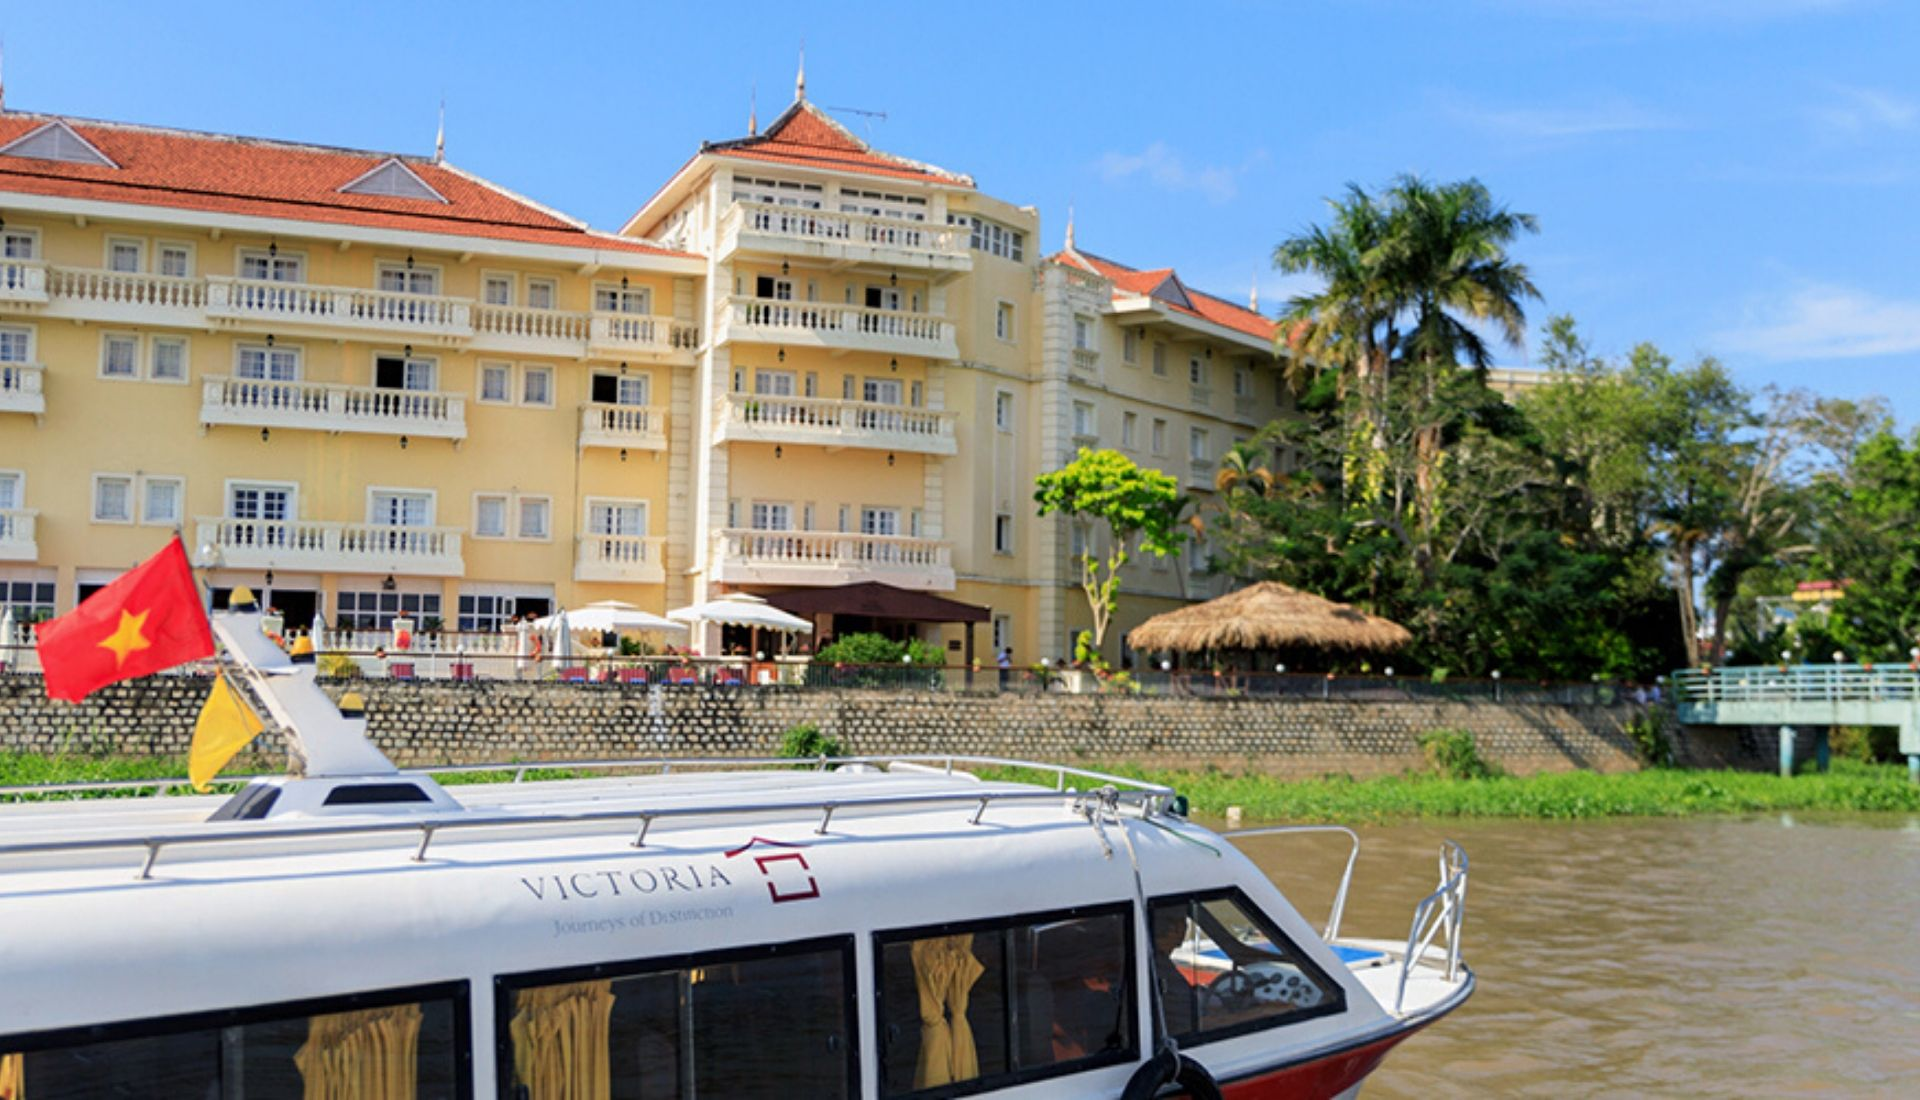 Victoria Speedboat to Cambodia